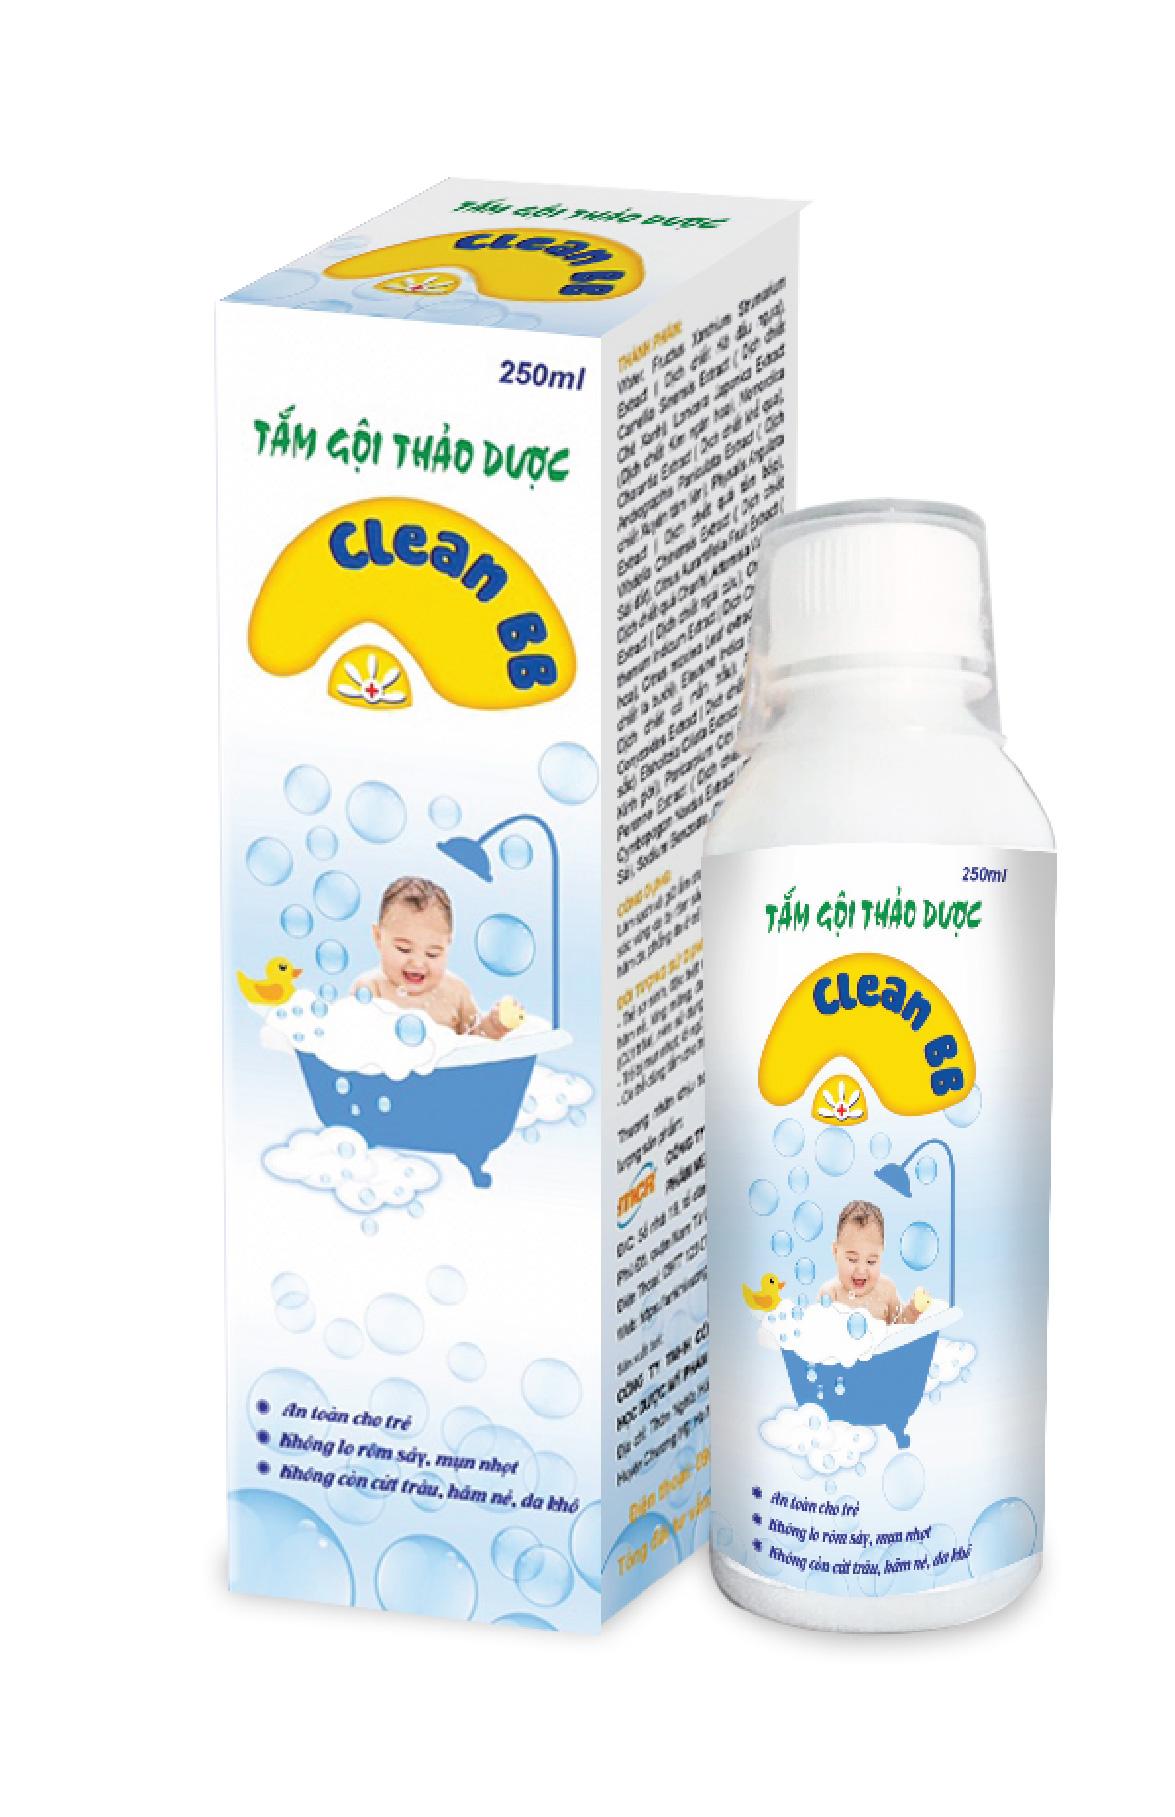 tam-goi-thao-duoc-clean-bb